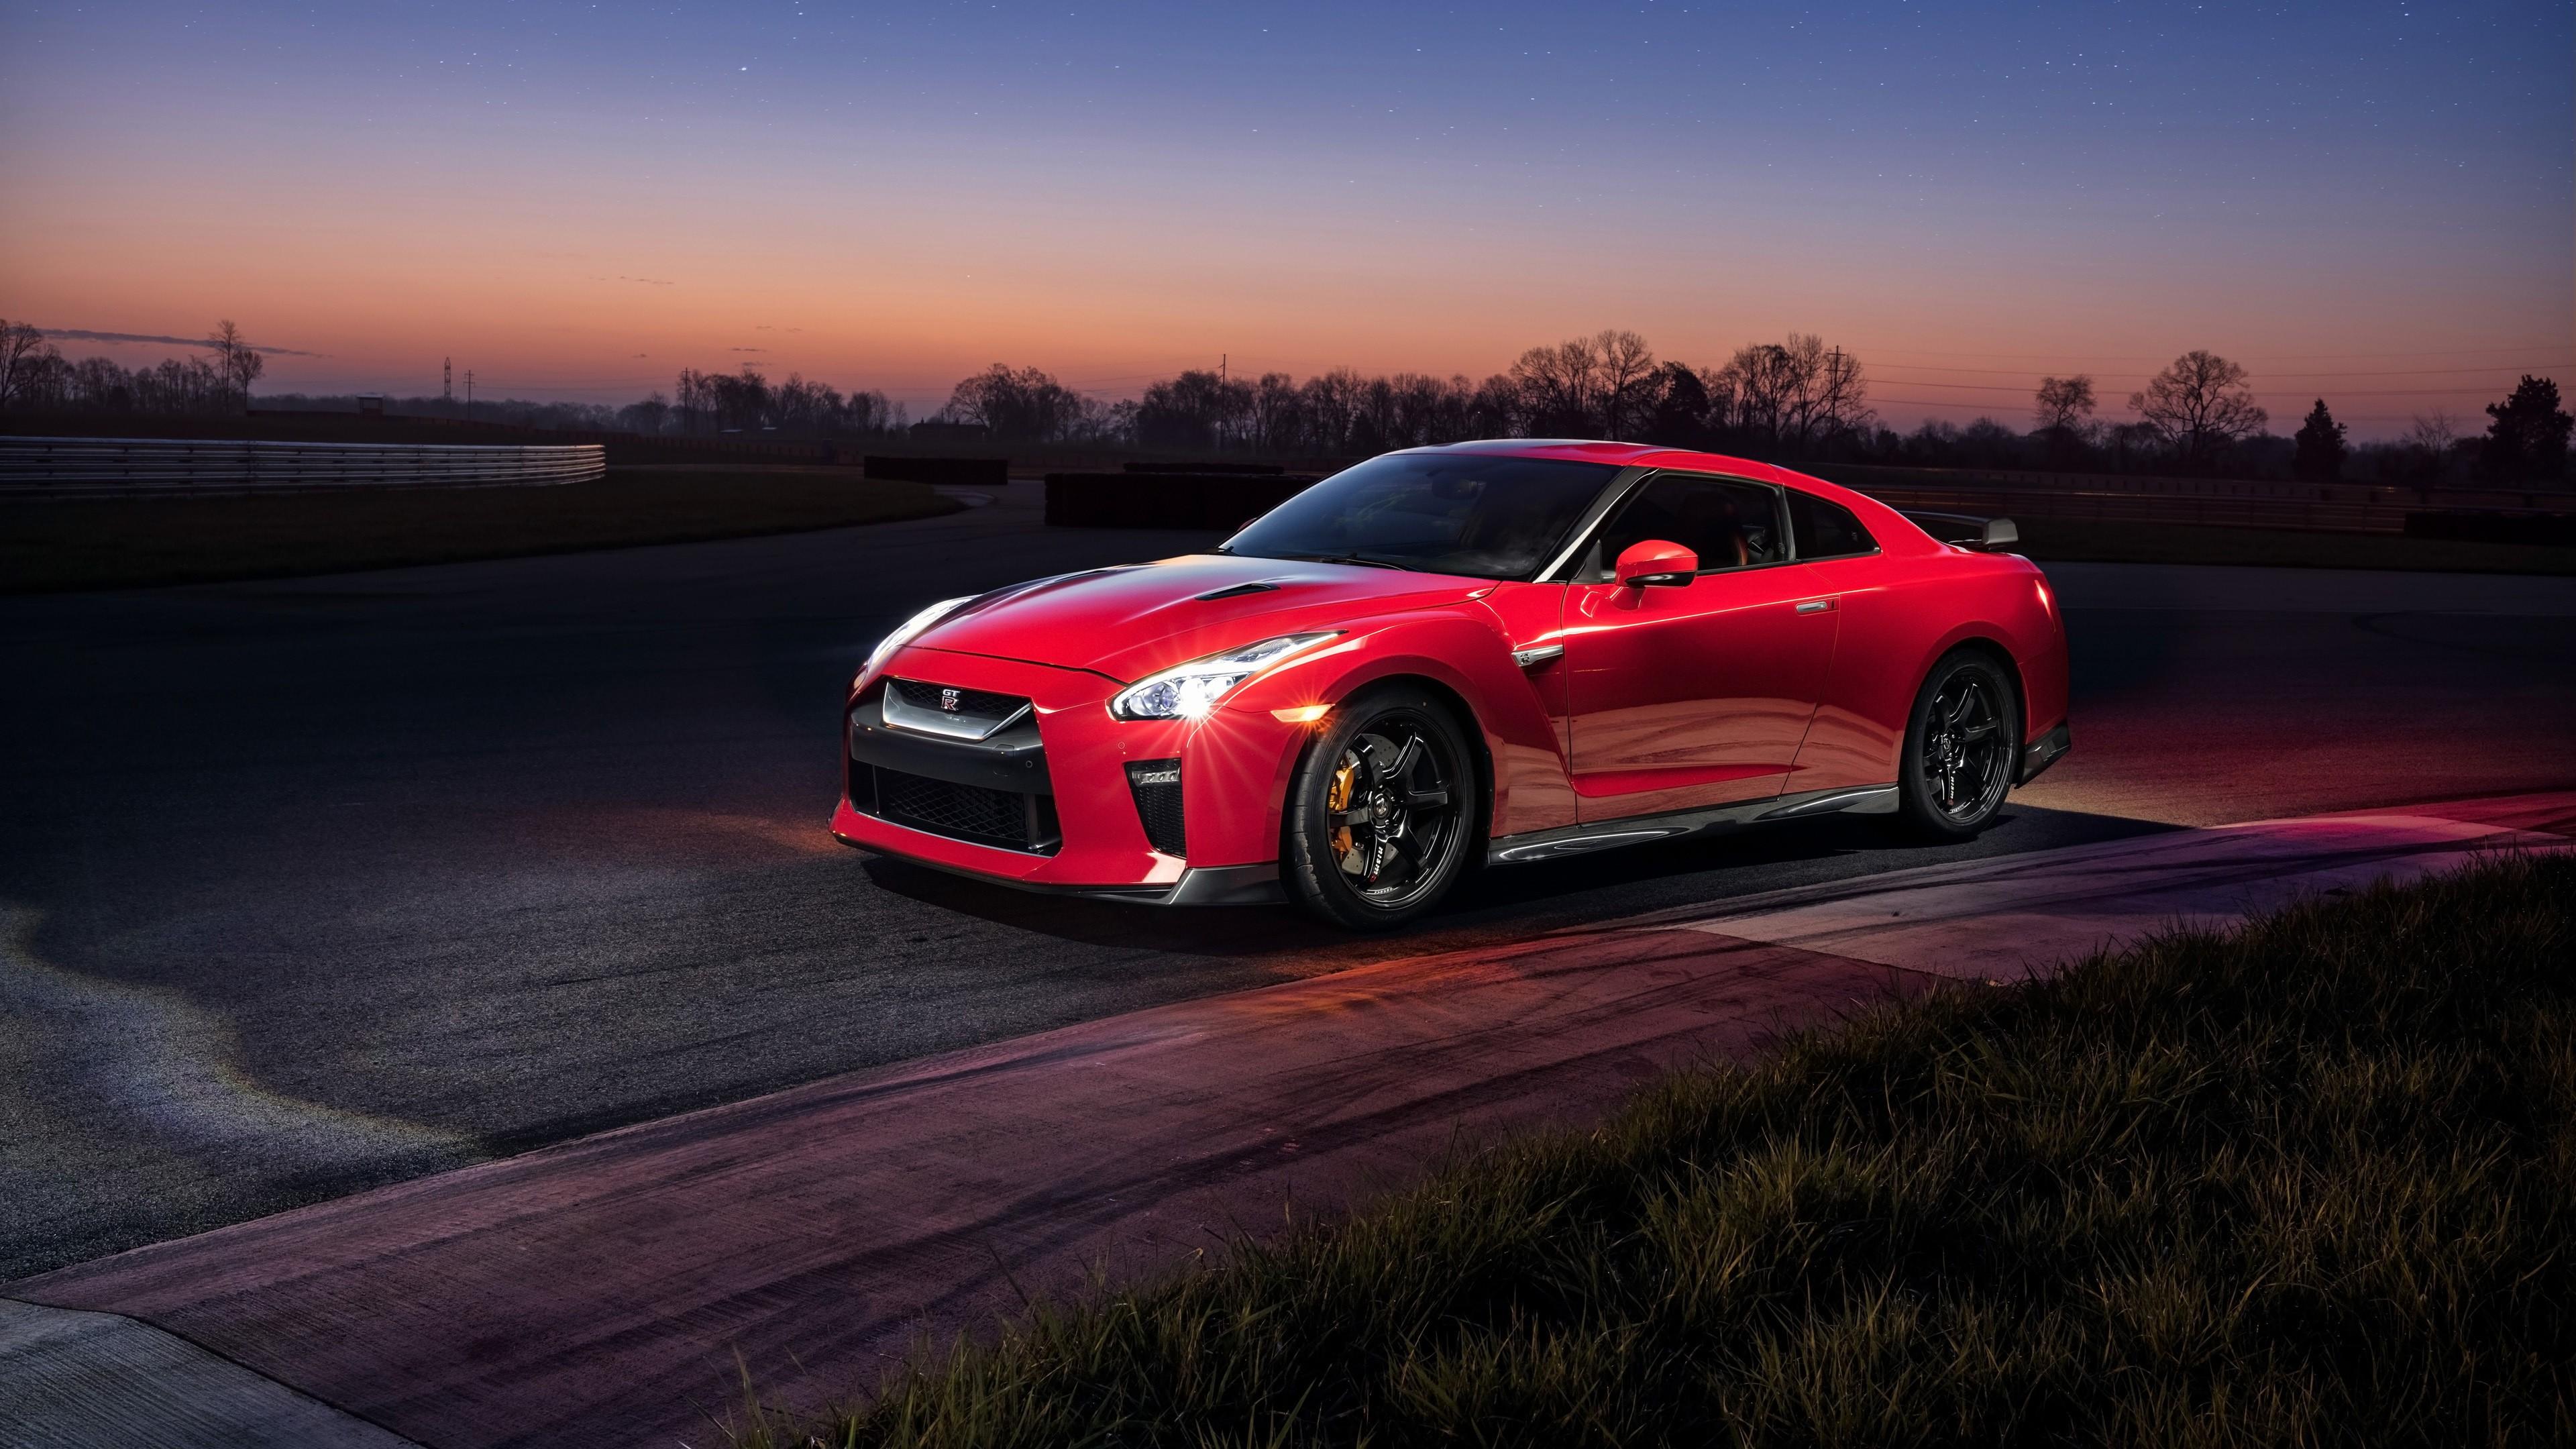 Nissan GT R Track Edition 2017 4K Wallpaper | HD Car ...